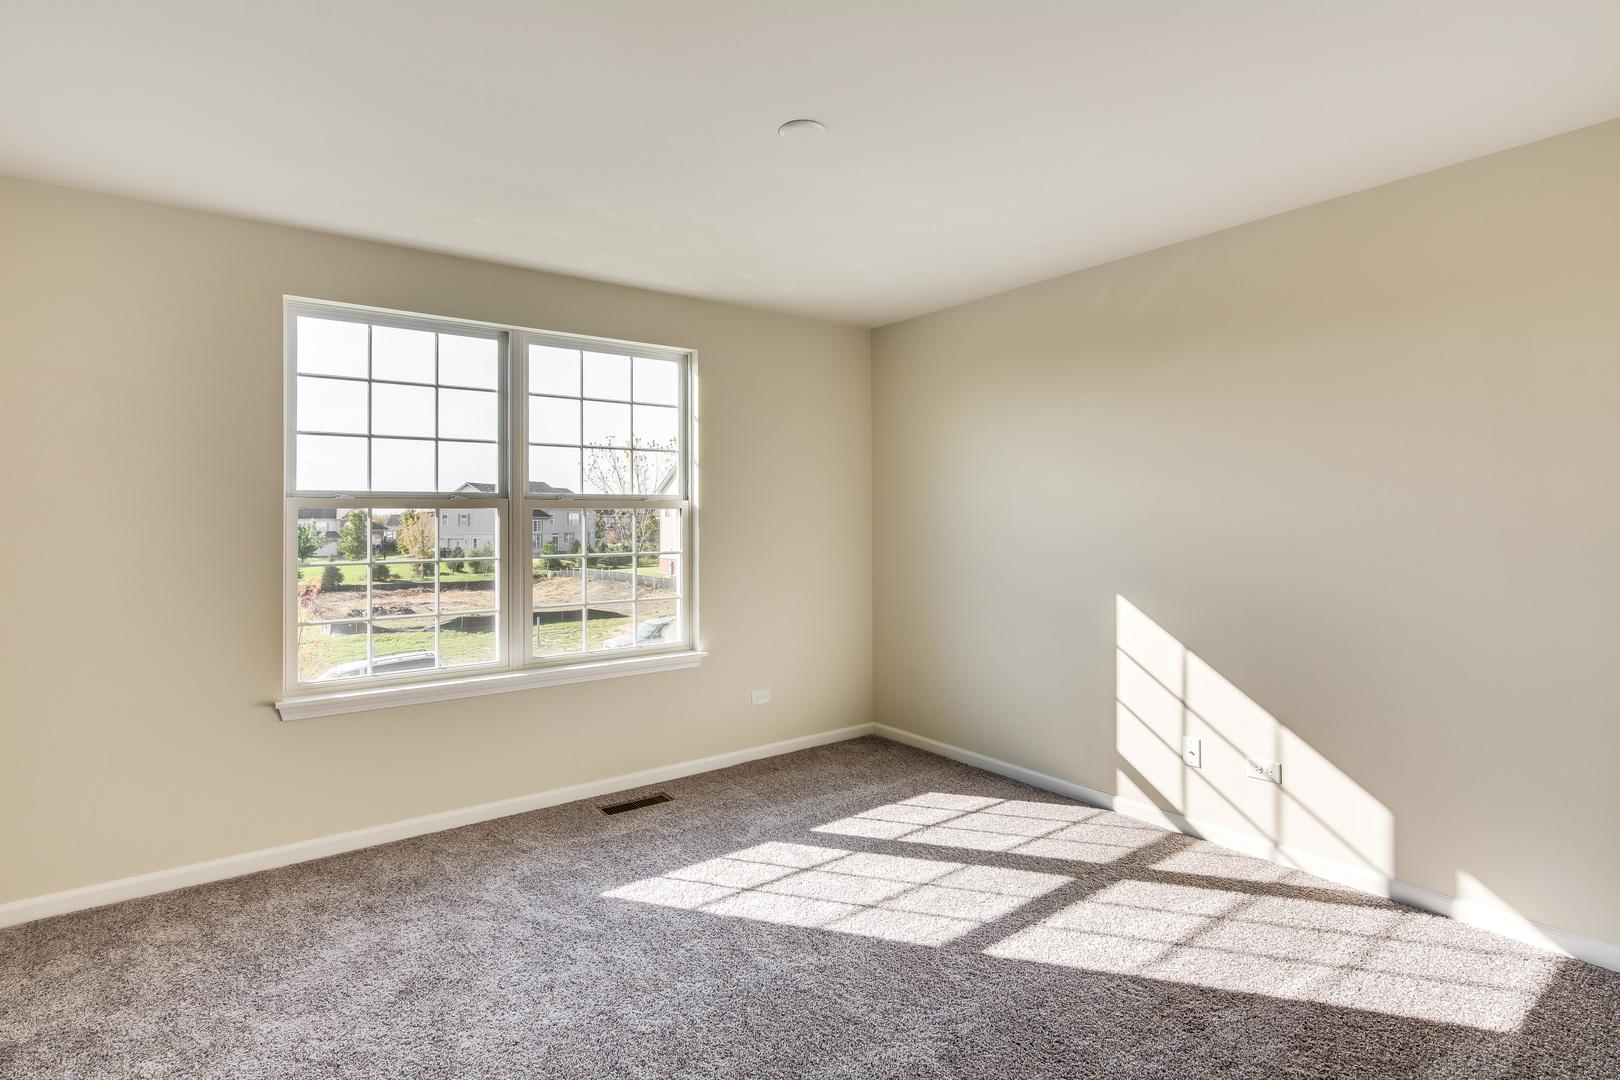 26 Andrew Lane, Hawthorn Woods, IL, 60047 | john greene Realtor